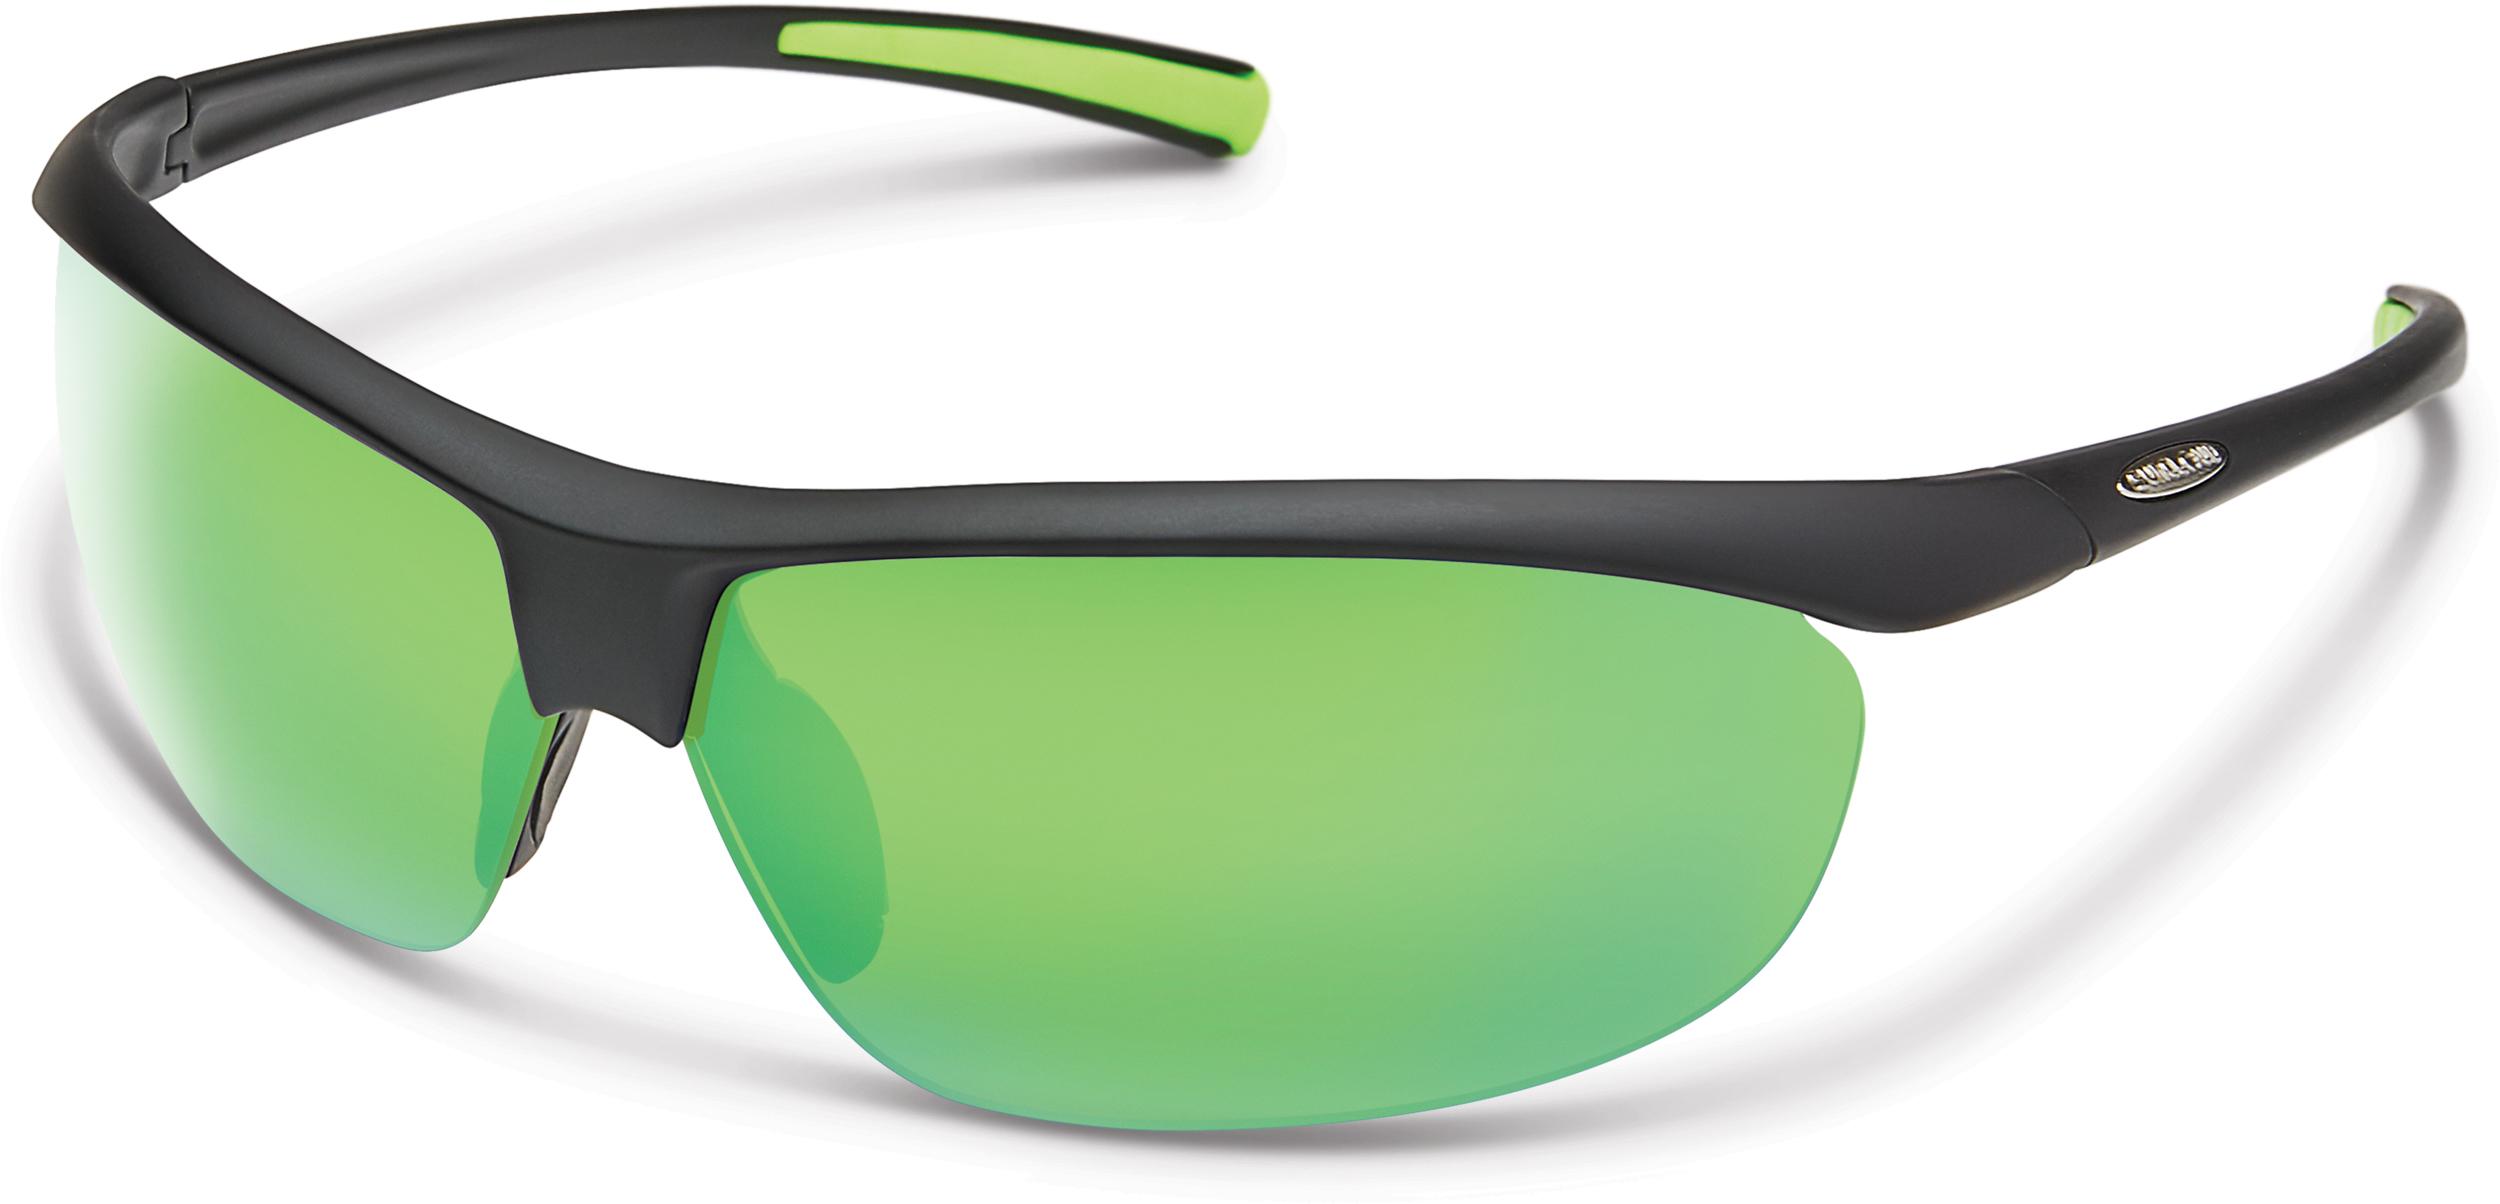 9f29bb99874 Suncloud Zephyr Polarized Sunglasses - Unisex